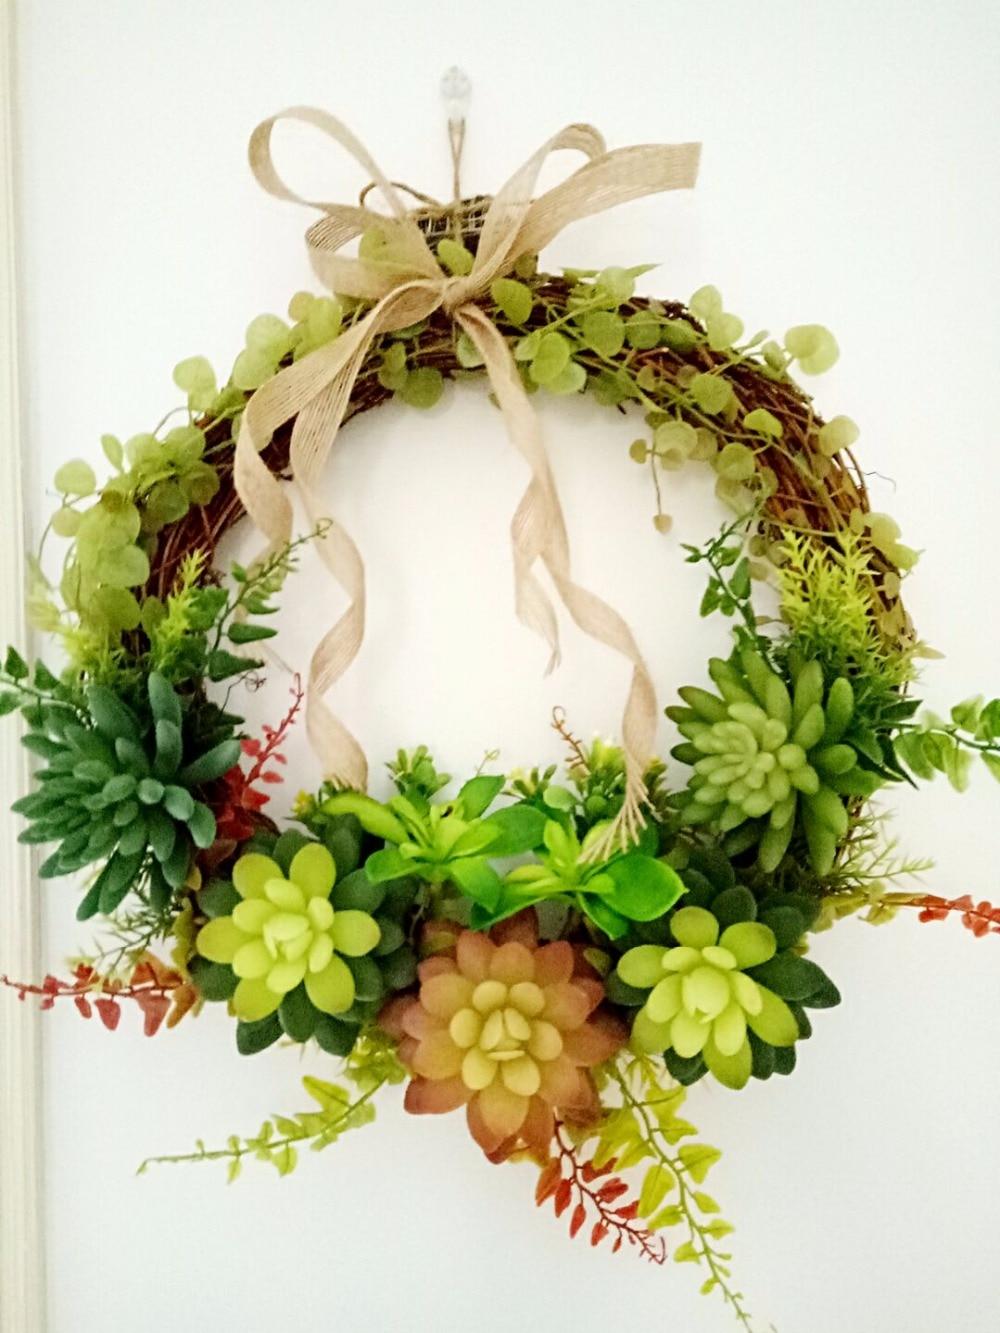 Artificial Succulent plants bowknot Door lintel Flower